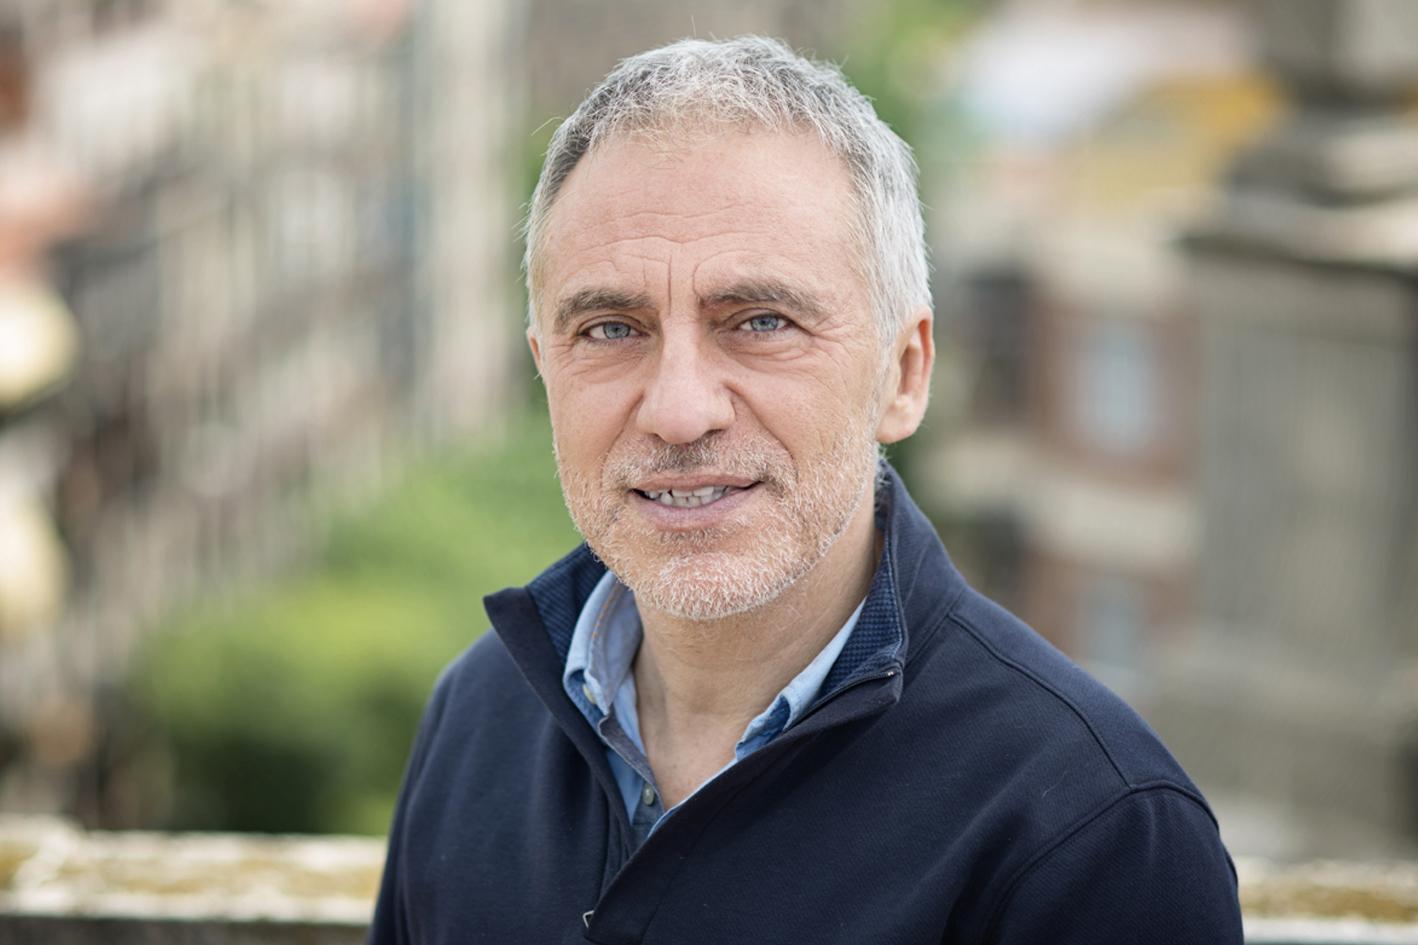 Josep Mª Herrera Jofre